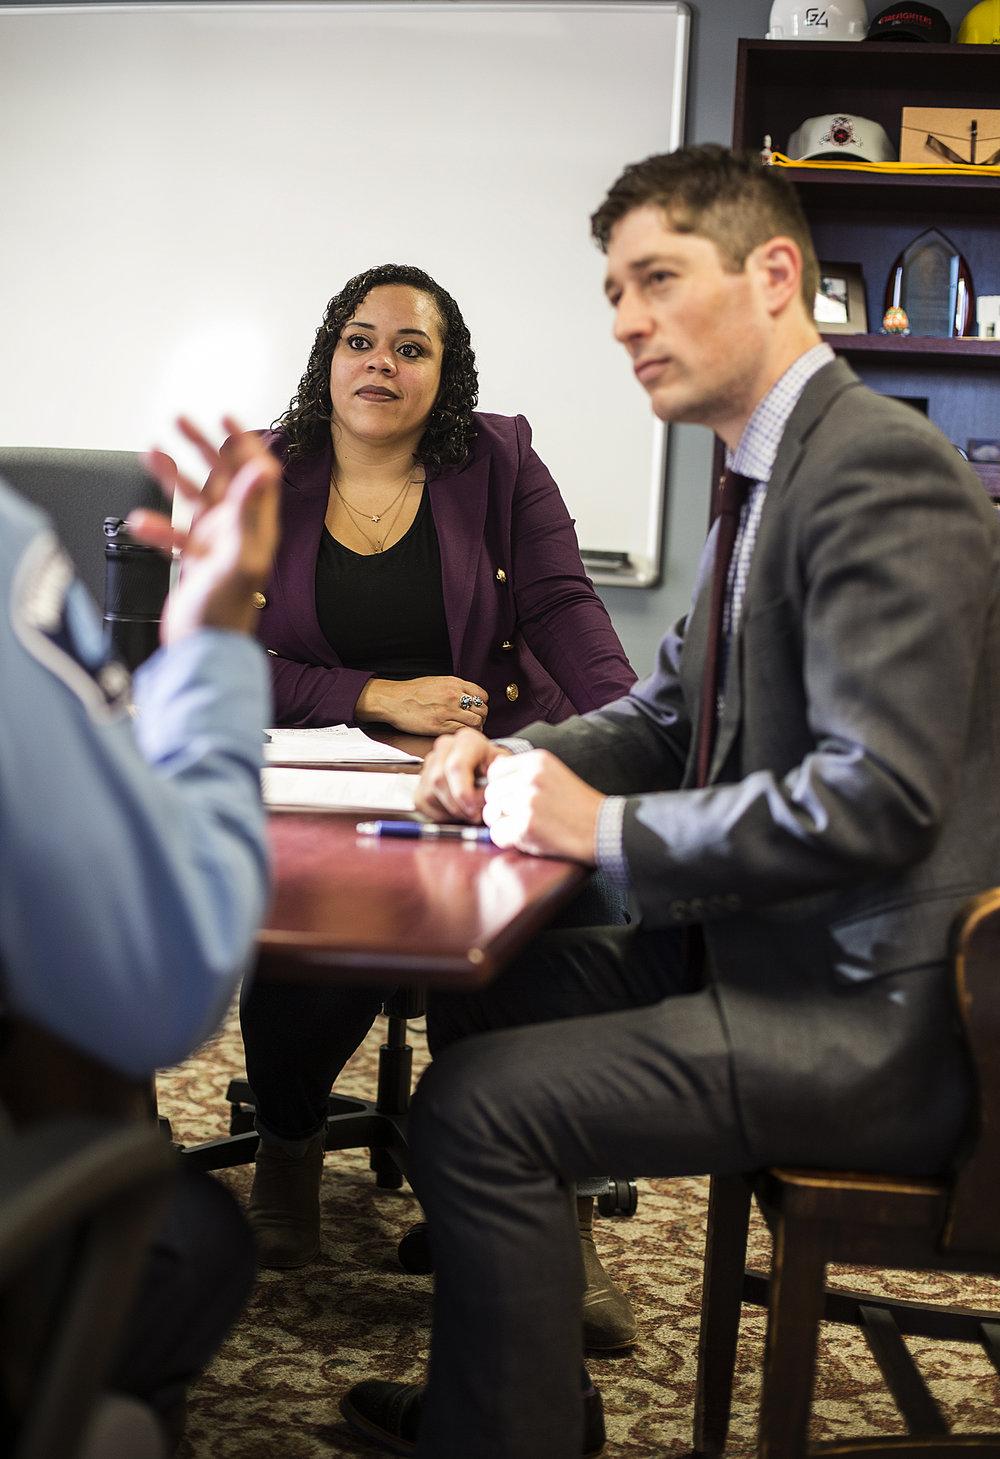 Jen White and her boss, Mayor Jacob Frey, meet with Minneapolis Police Chief Medaria Arradondo.